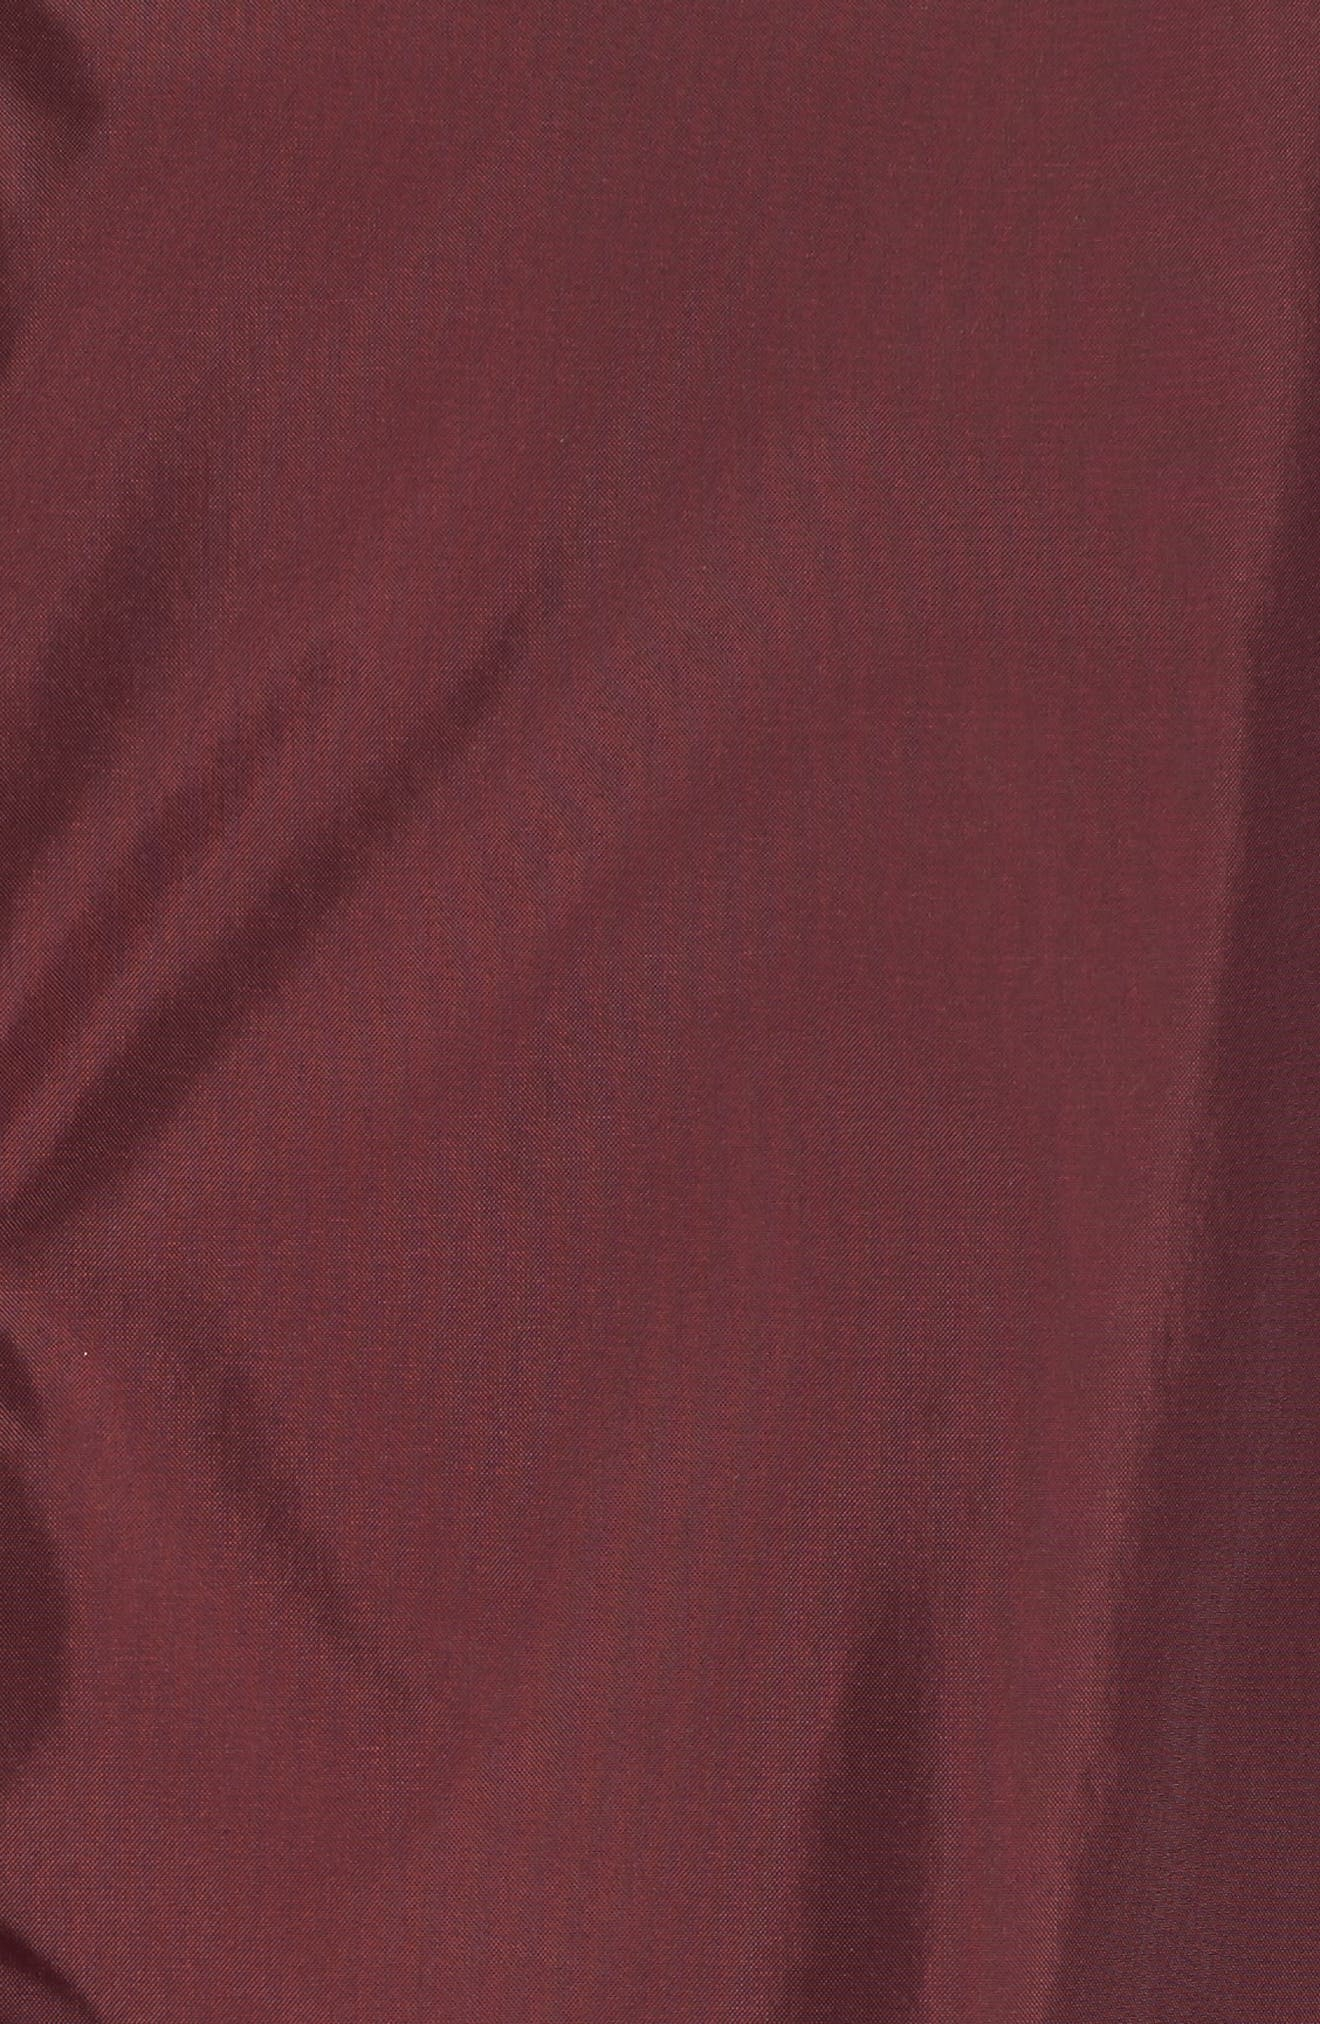 Torrey Water Resistant Jacket,                             Alternate thumbnail 5, color,                             Port Royale/ White